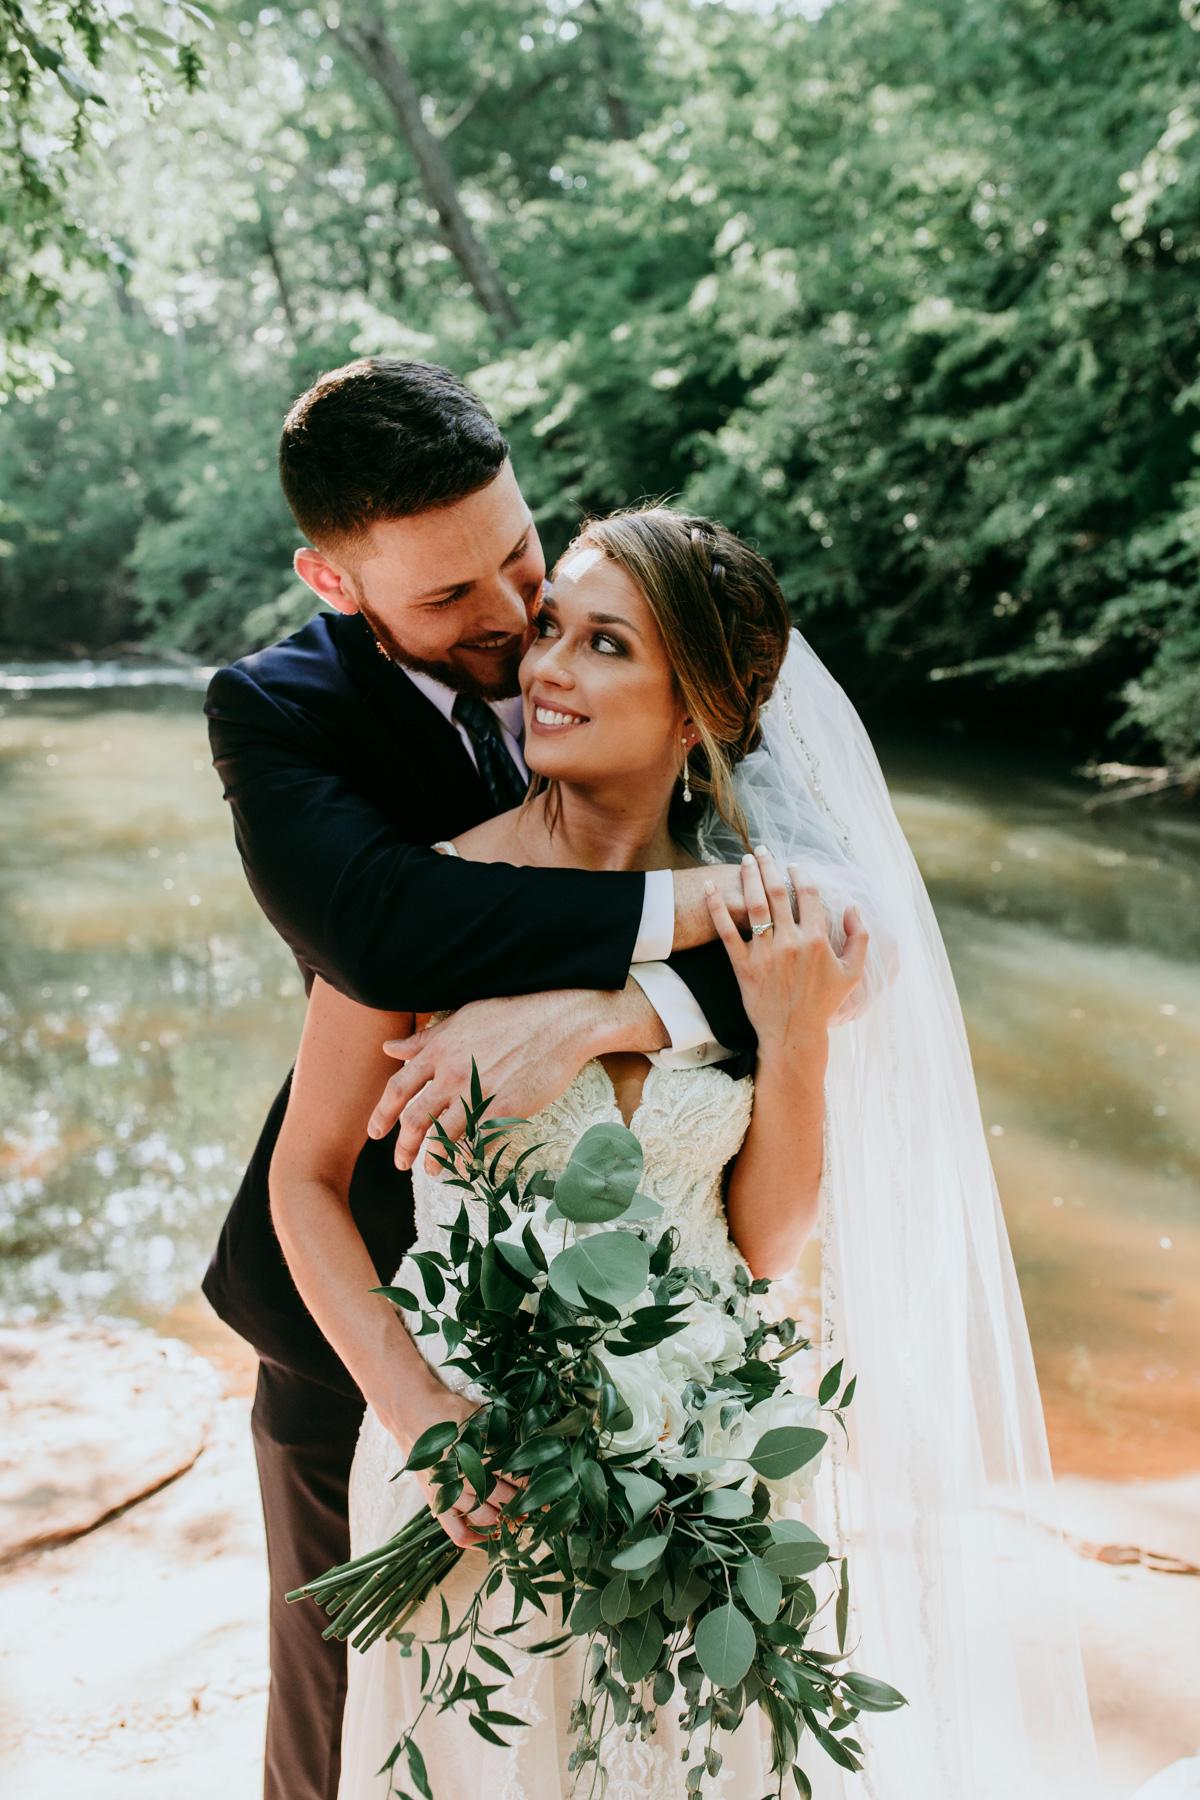 bride-and-groom-first-look-photos.jpg